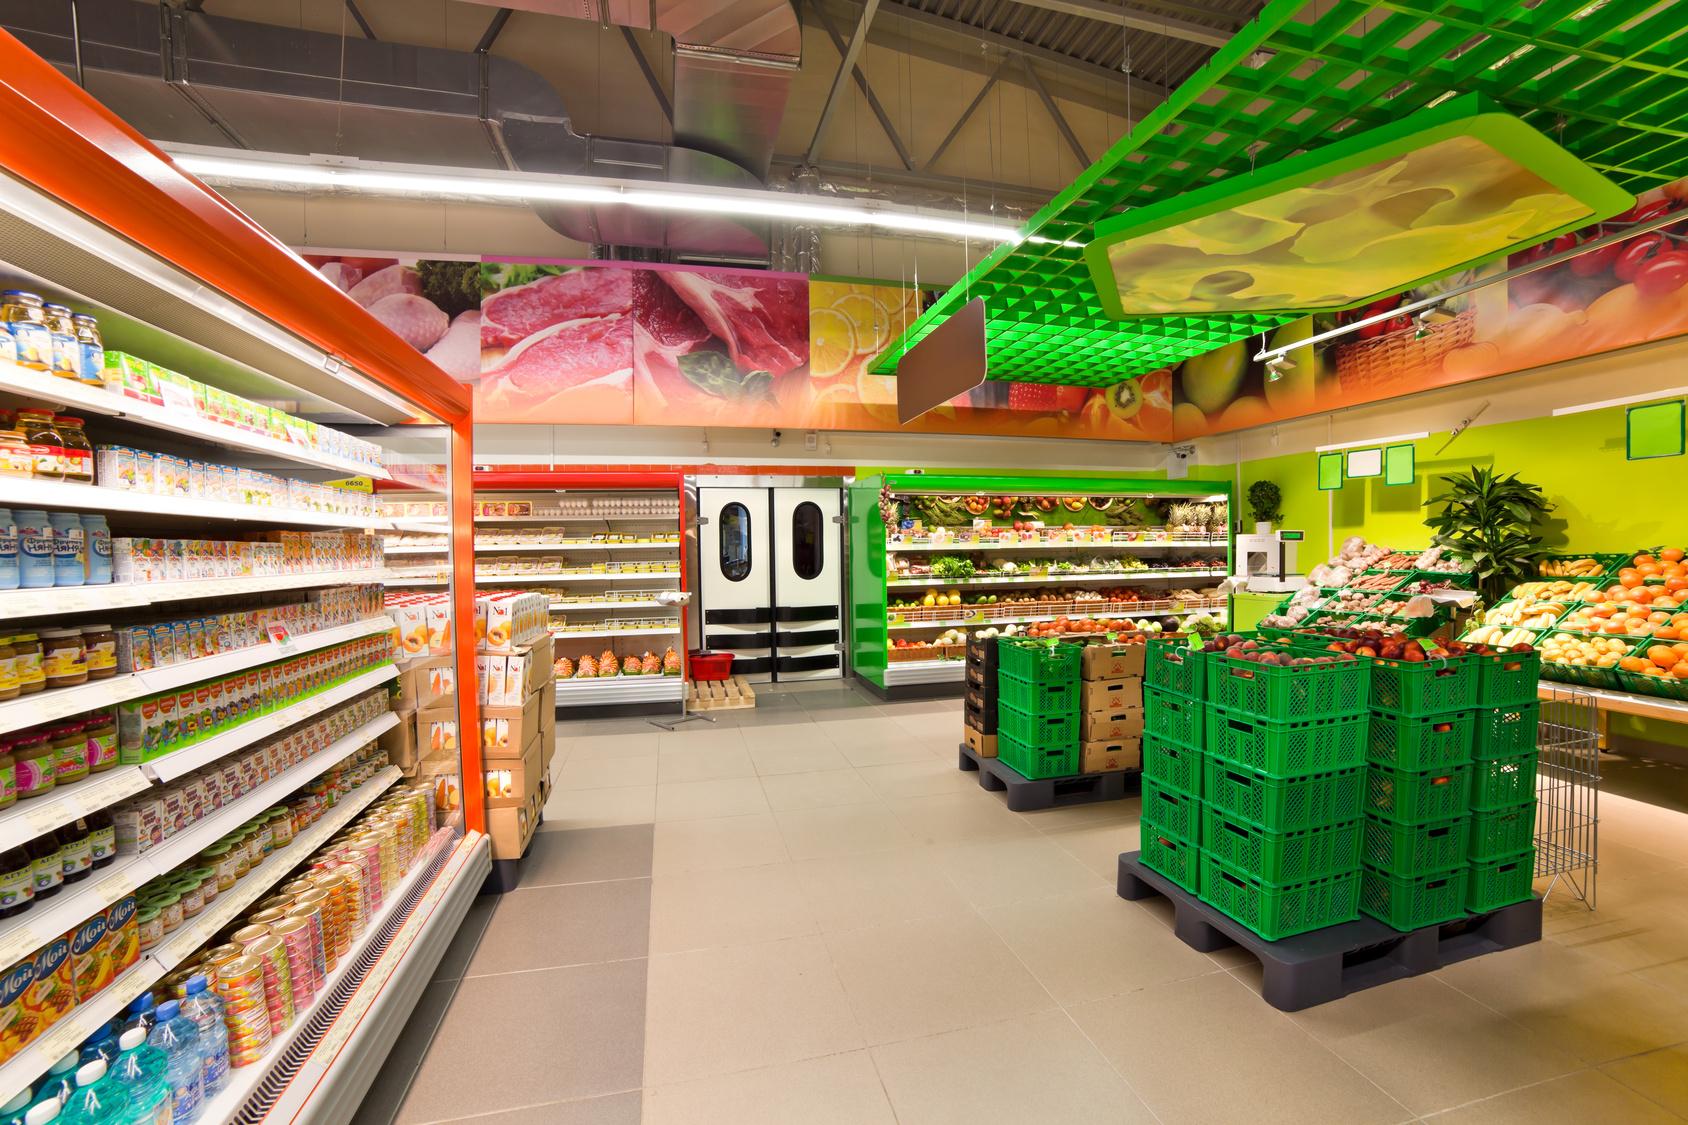 LEDBERG oświetlenie LED liniowe, supermarket